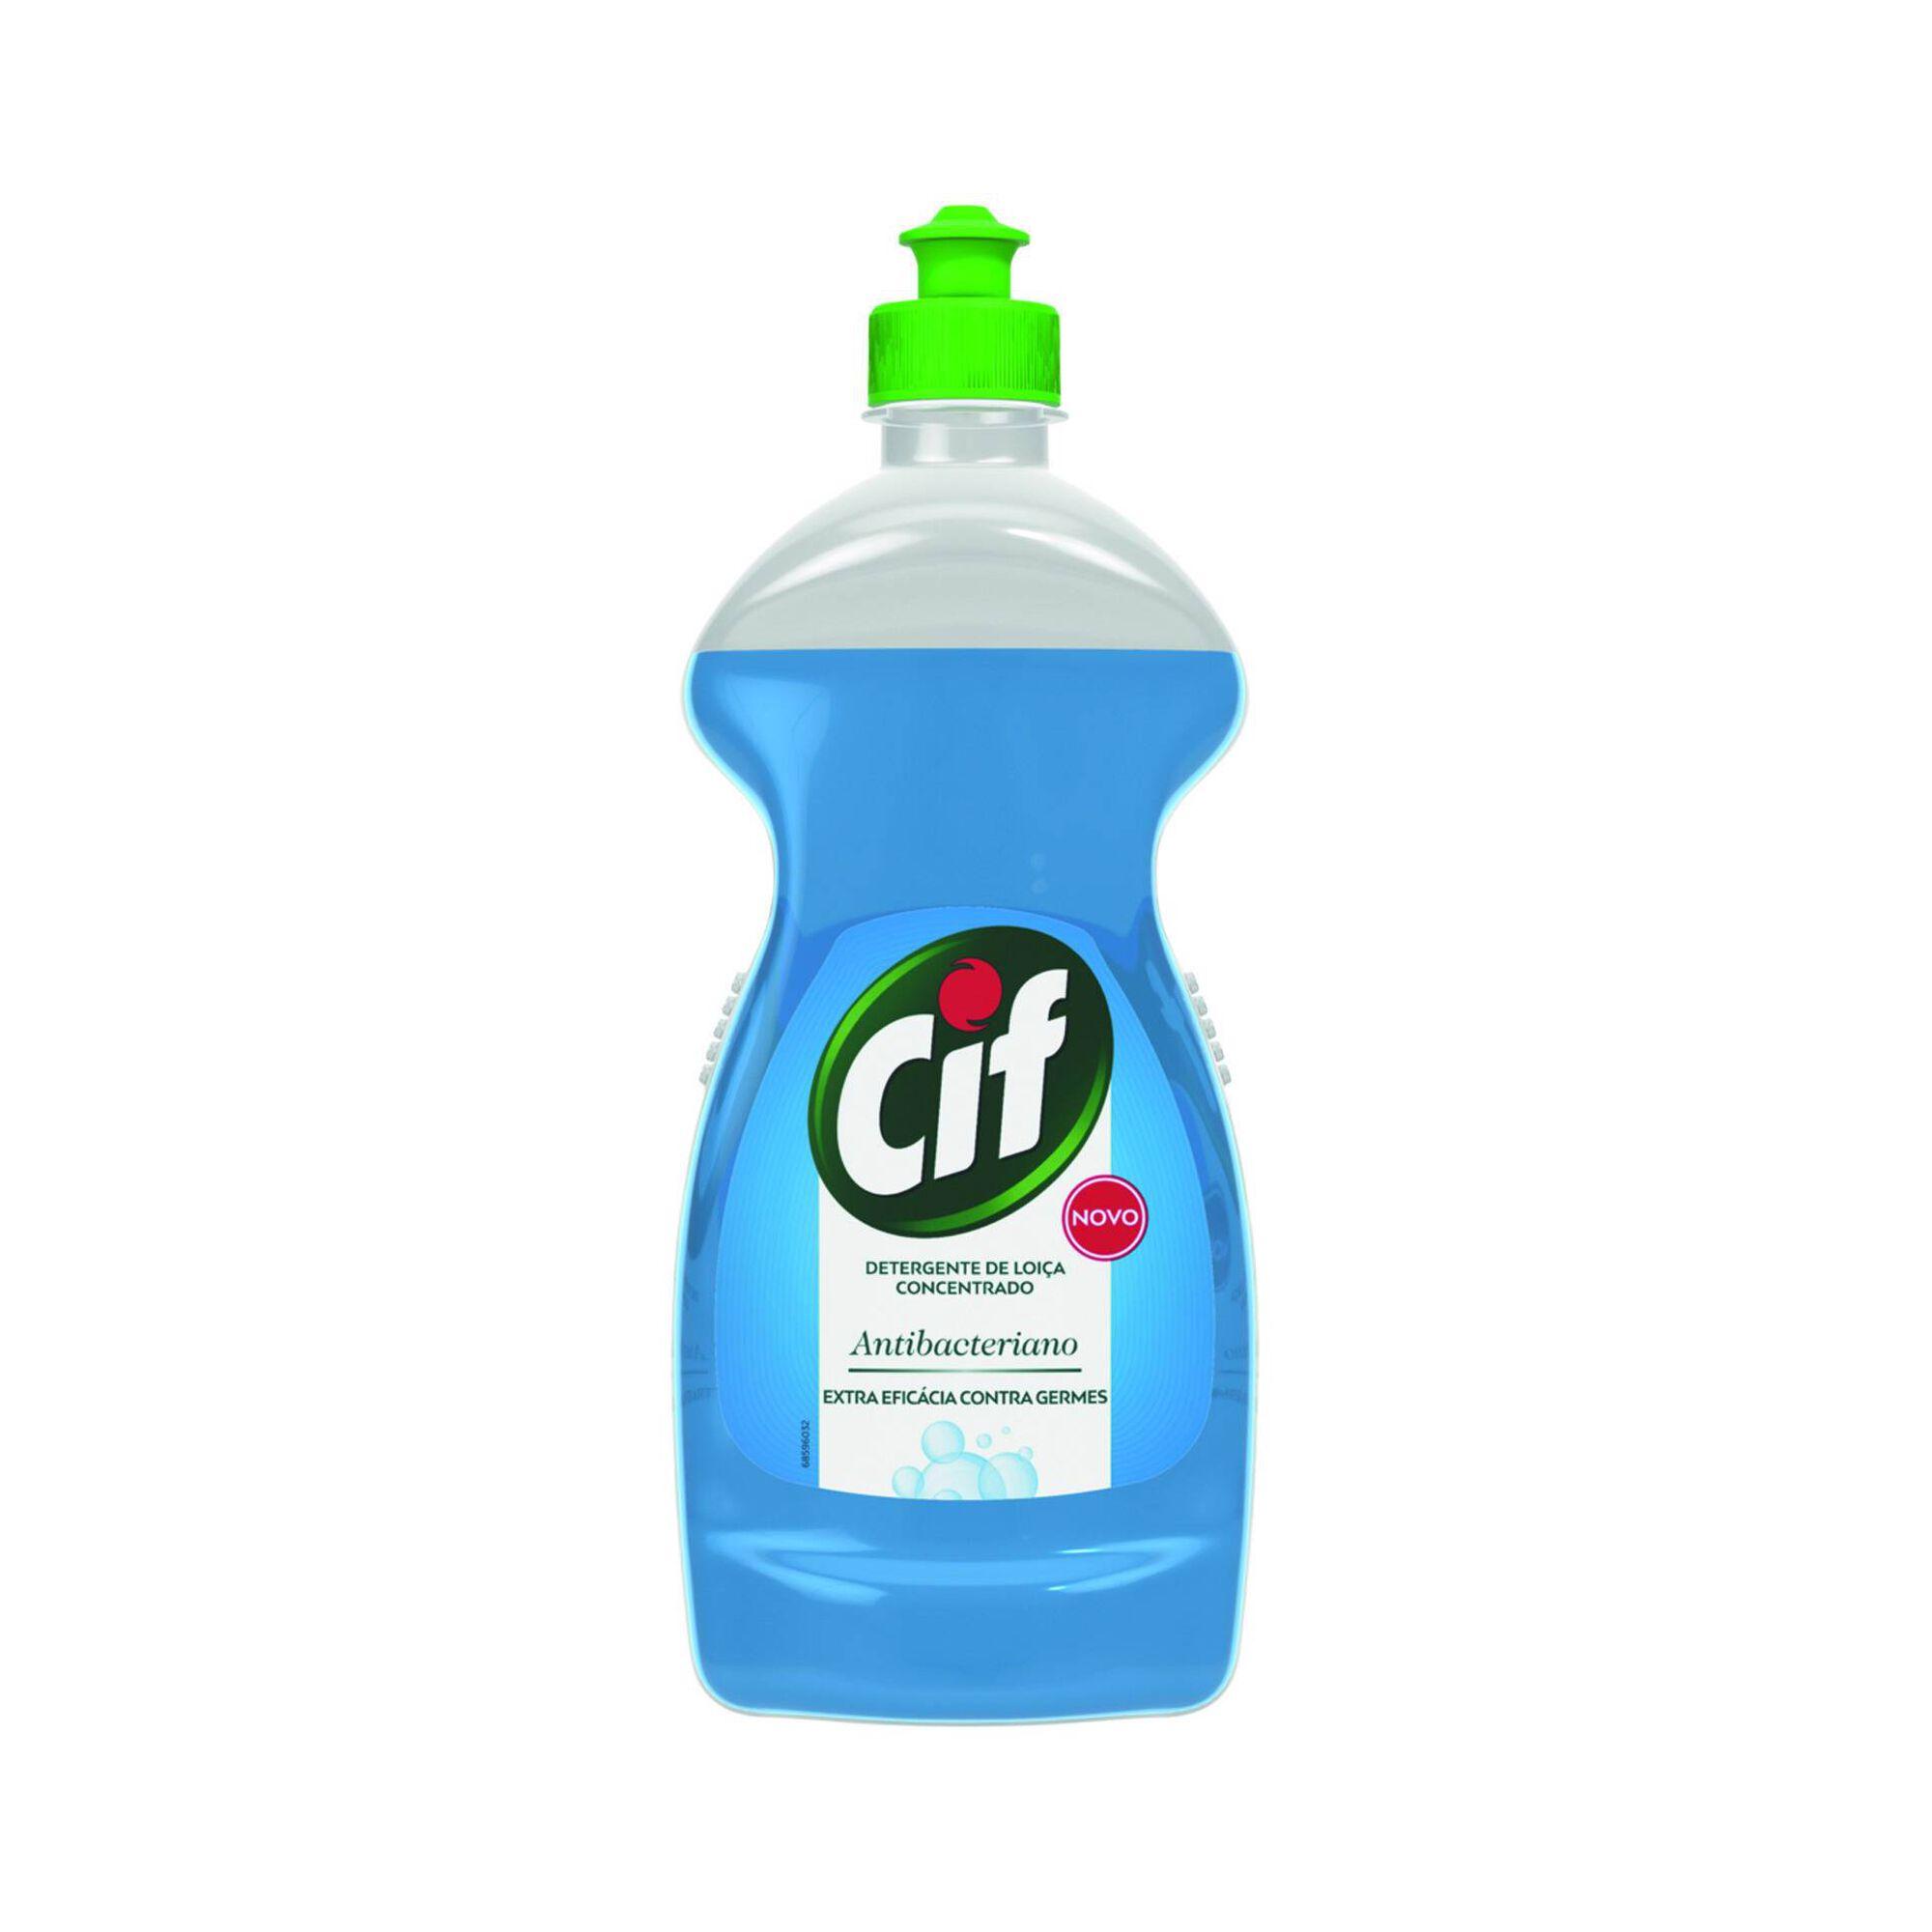 Detergente Manual Loiça Antibacteriano